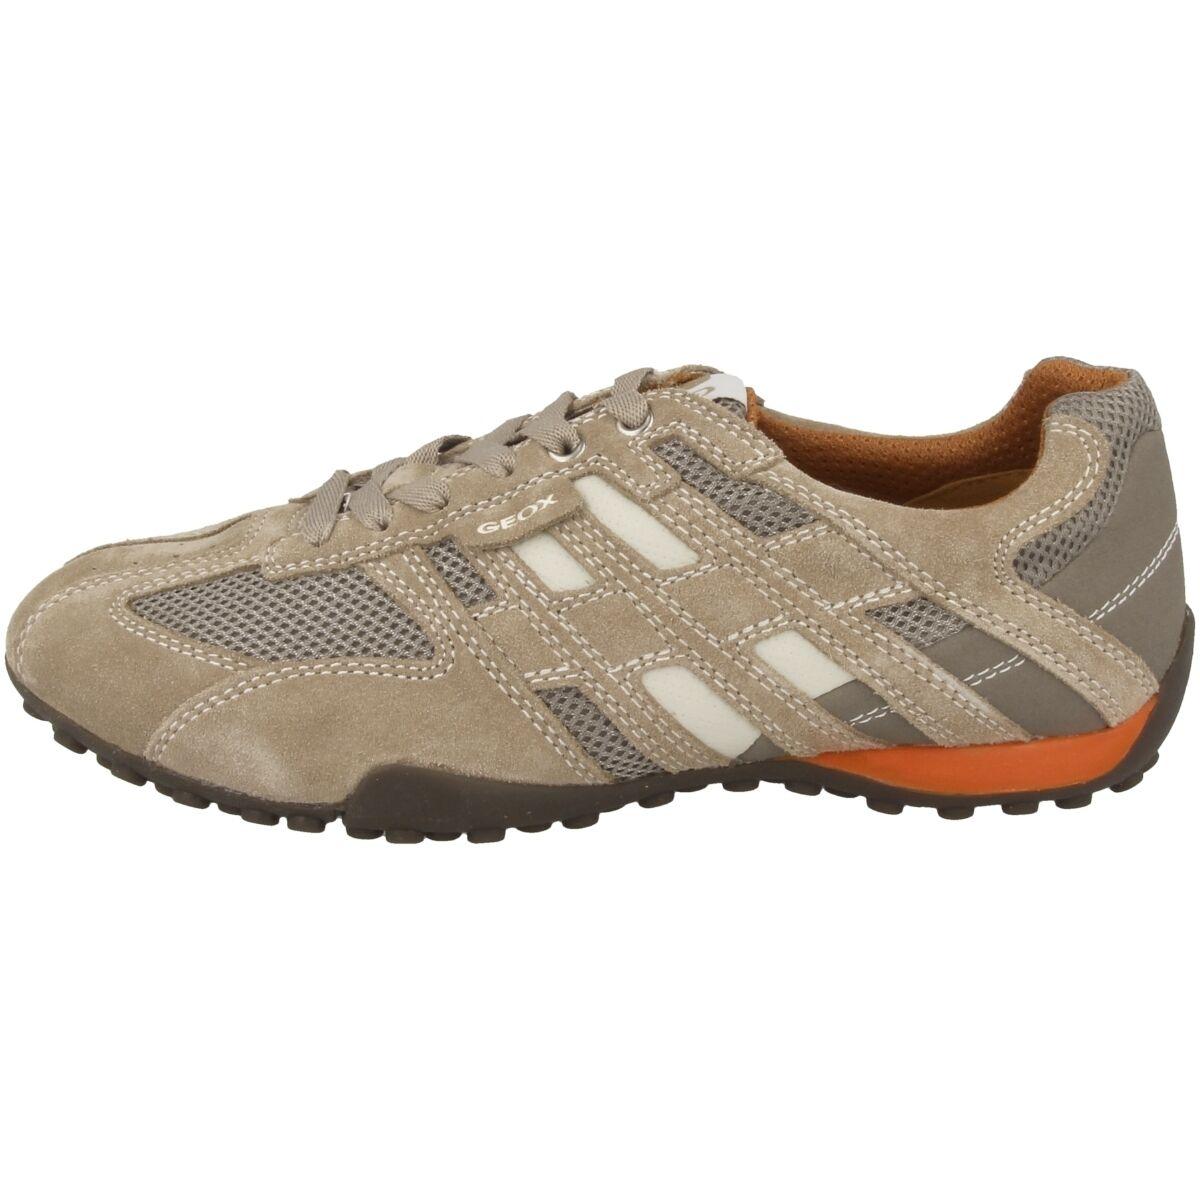 c536b7a89eaf Geox Geox Geox U Snake K shoes Sneakers men Mocassini di pelle Beige Box  86a62d